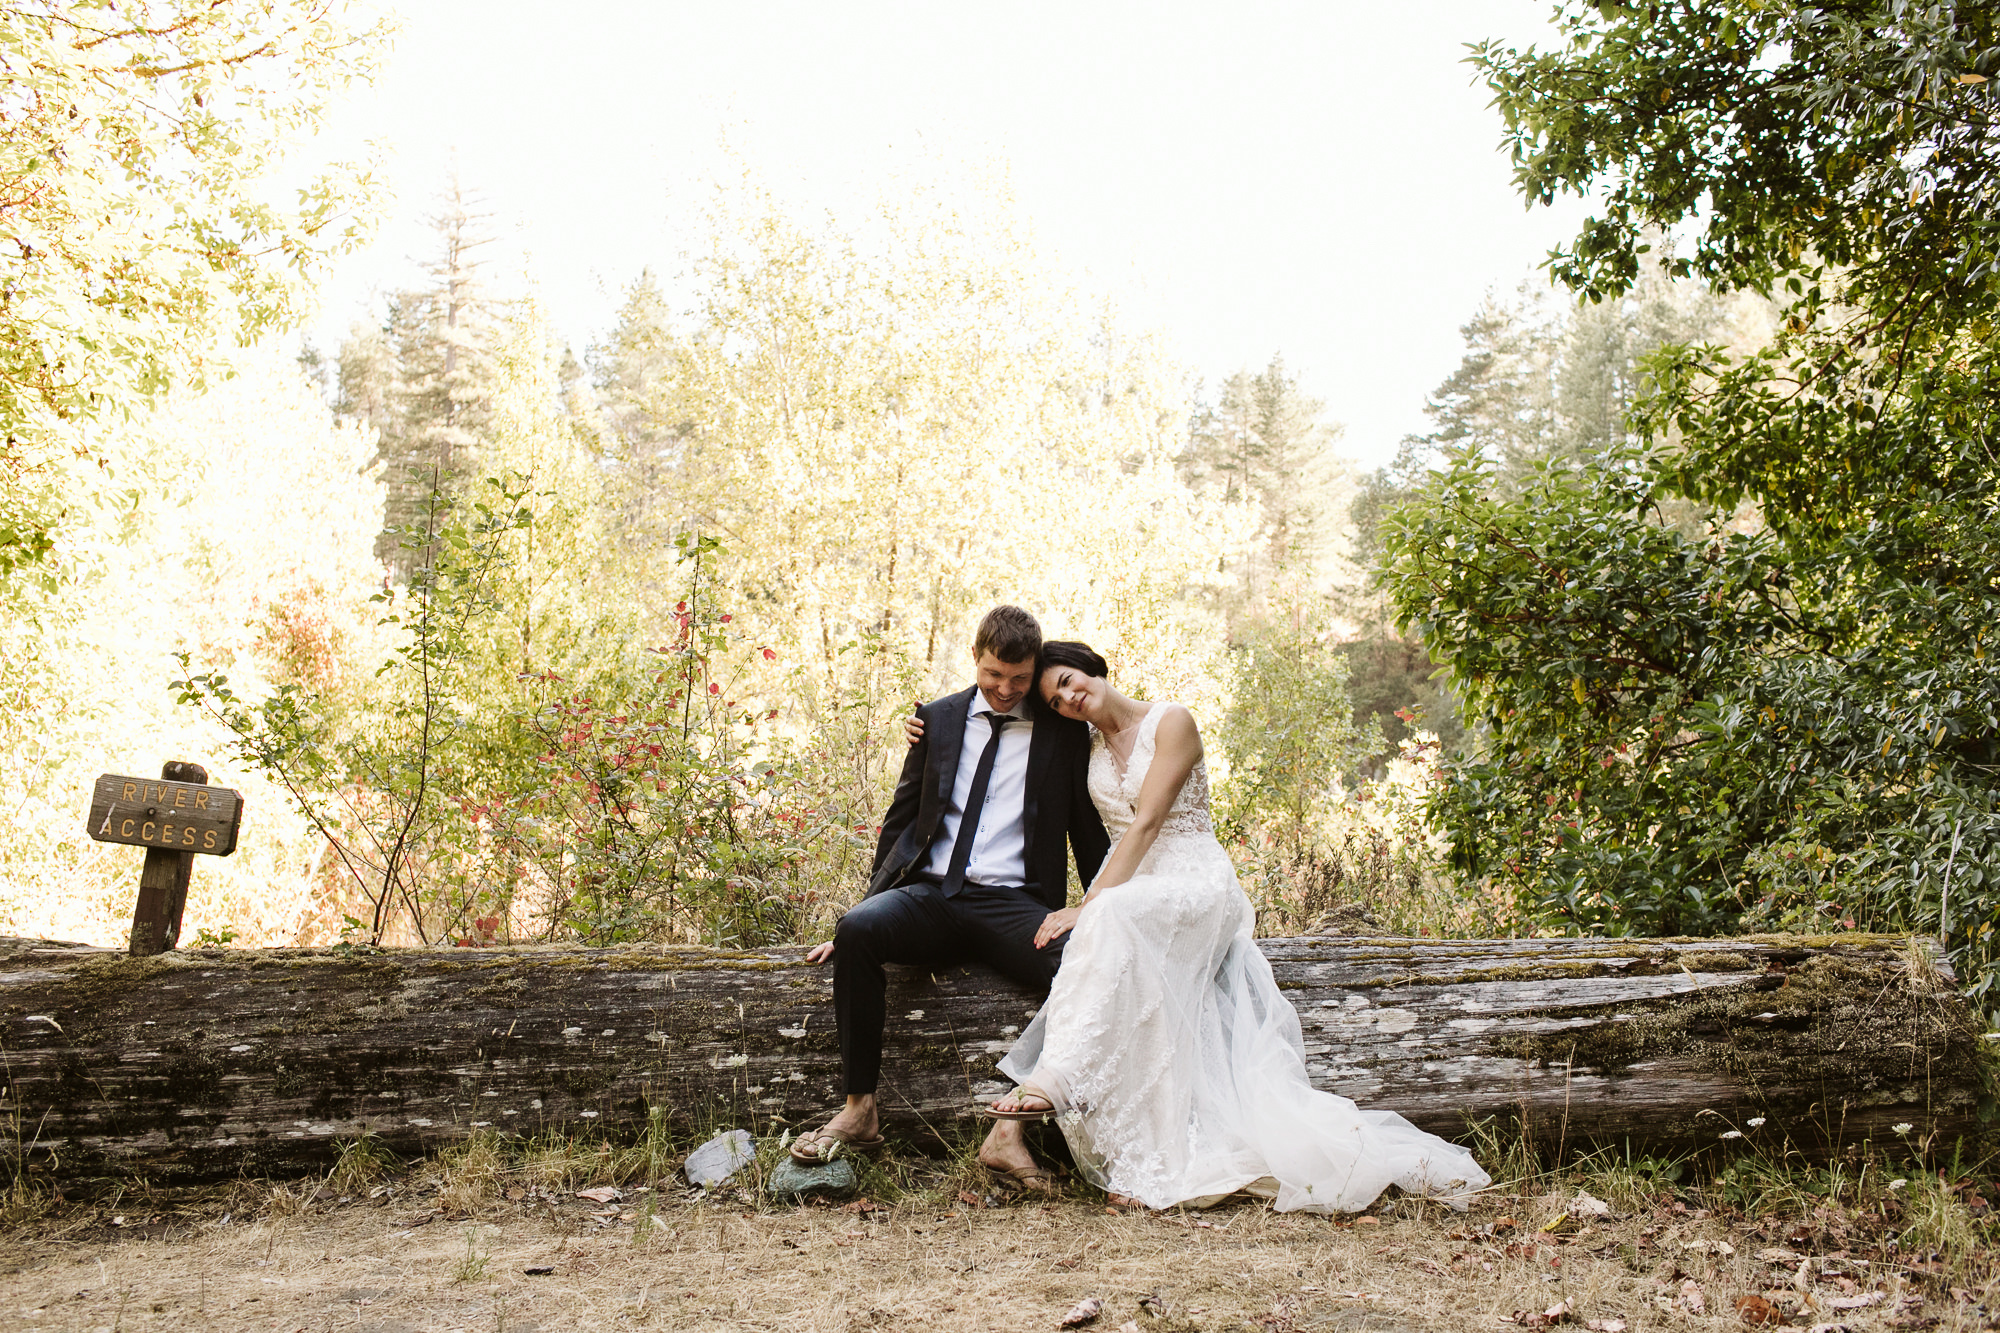 California-wedding-photographer-alfonso-flores-pamplin-groove-276.jpg